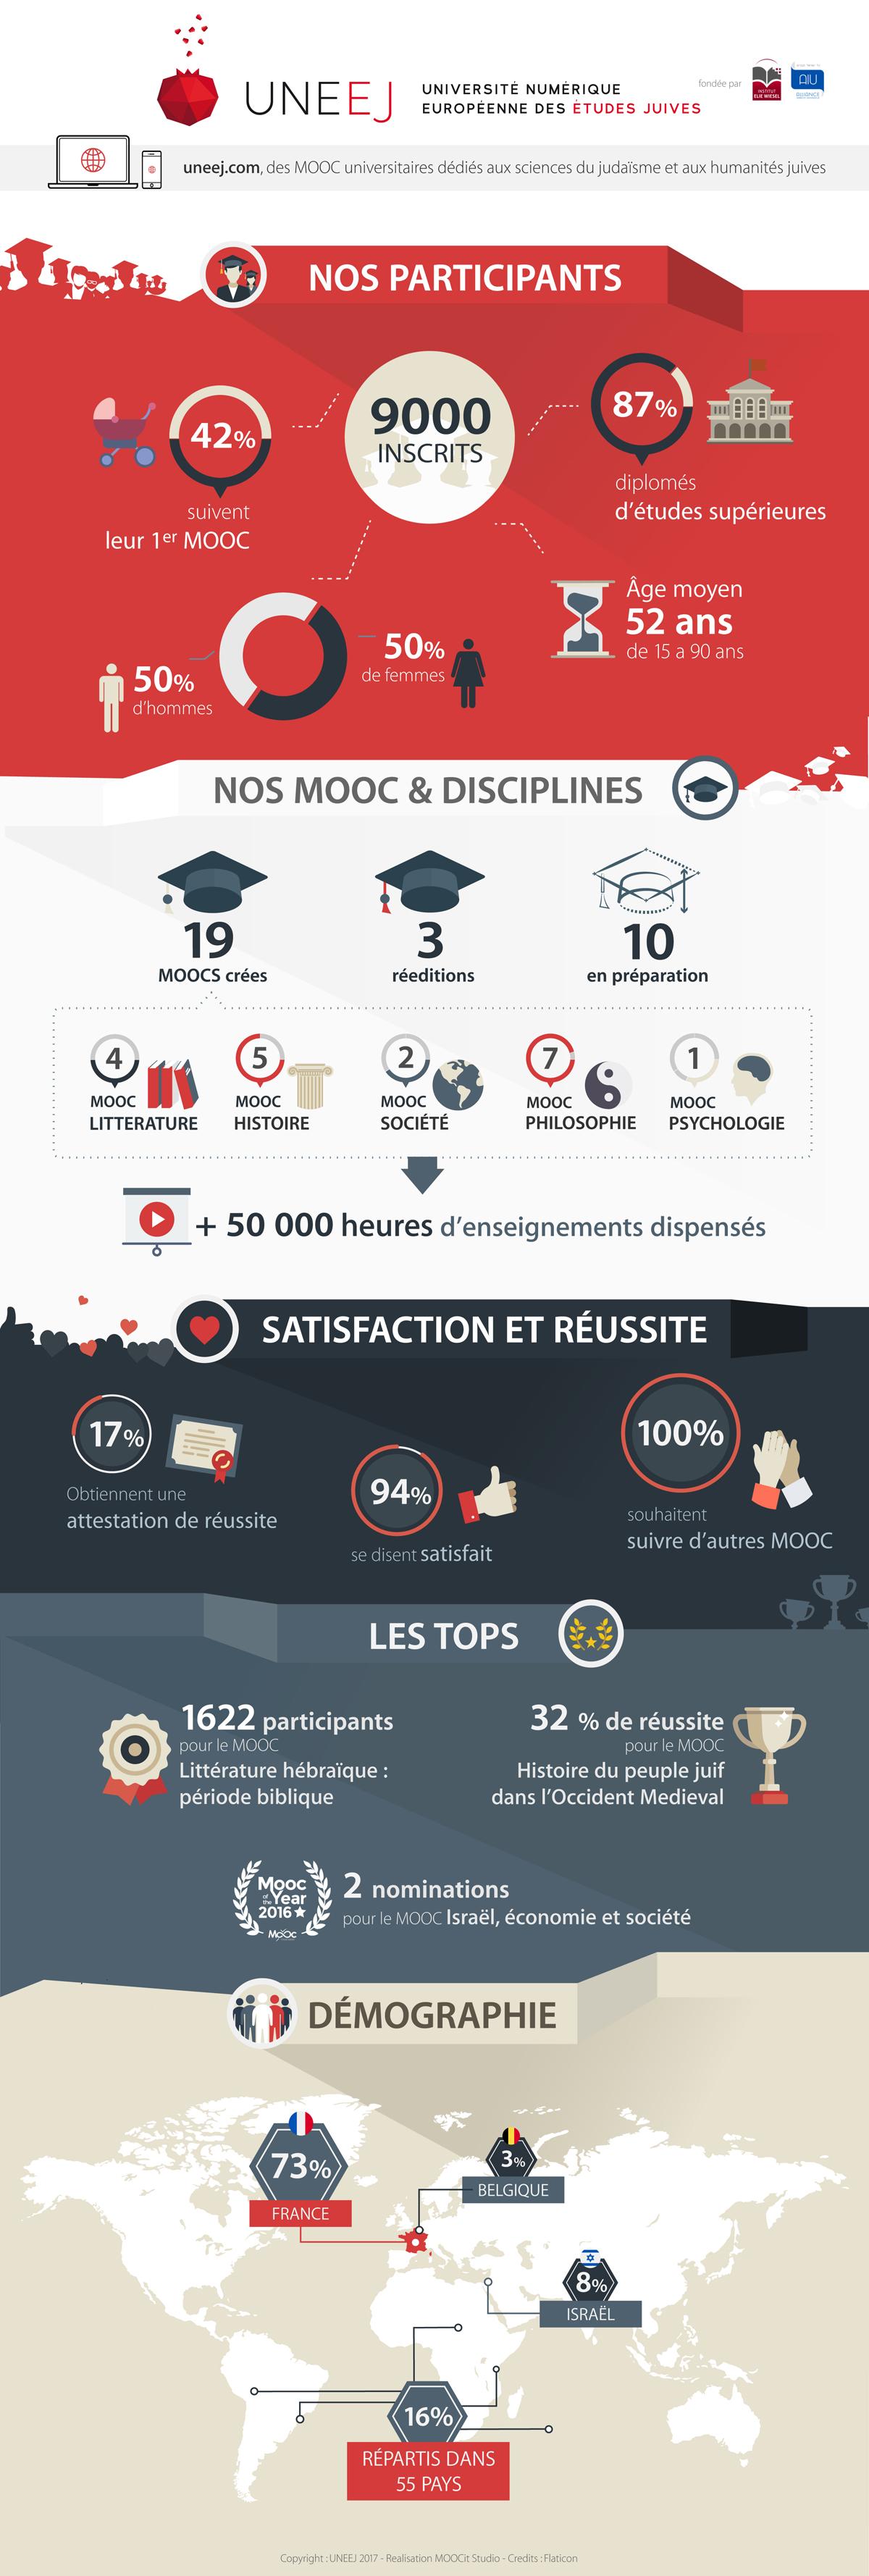 UNEEJ_Infographie_1200.jpg